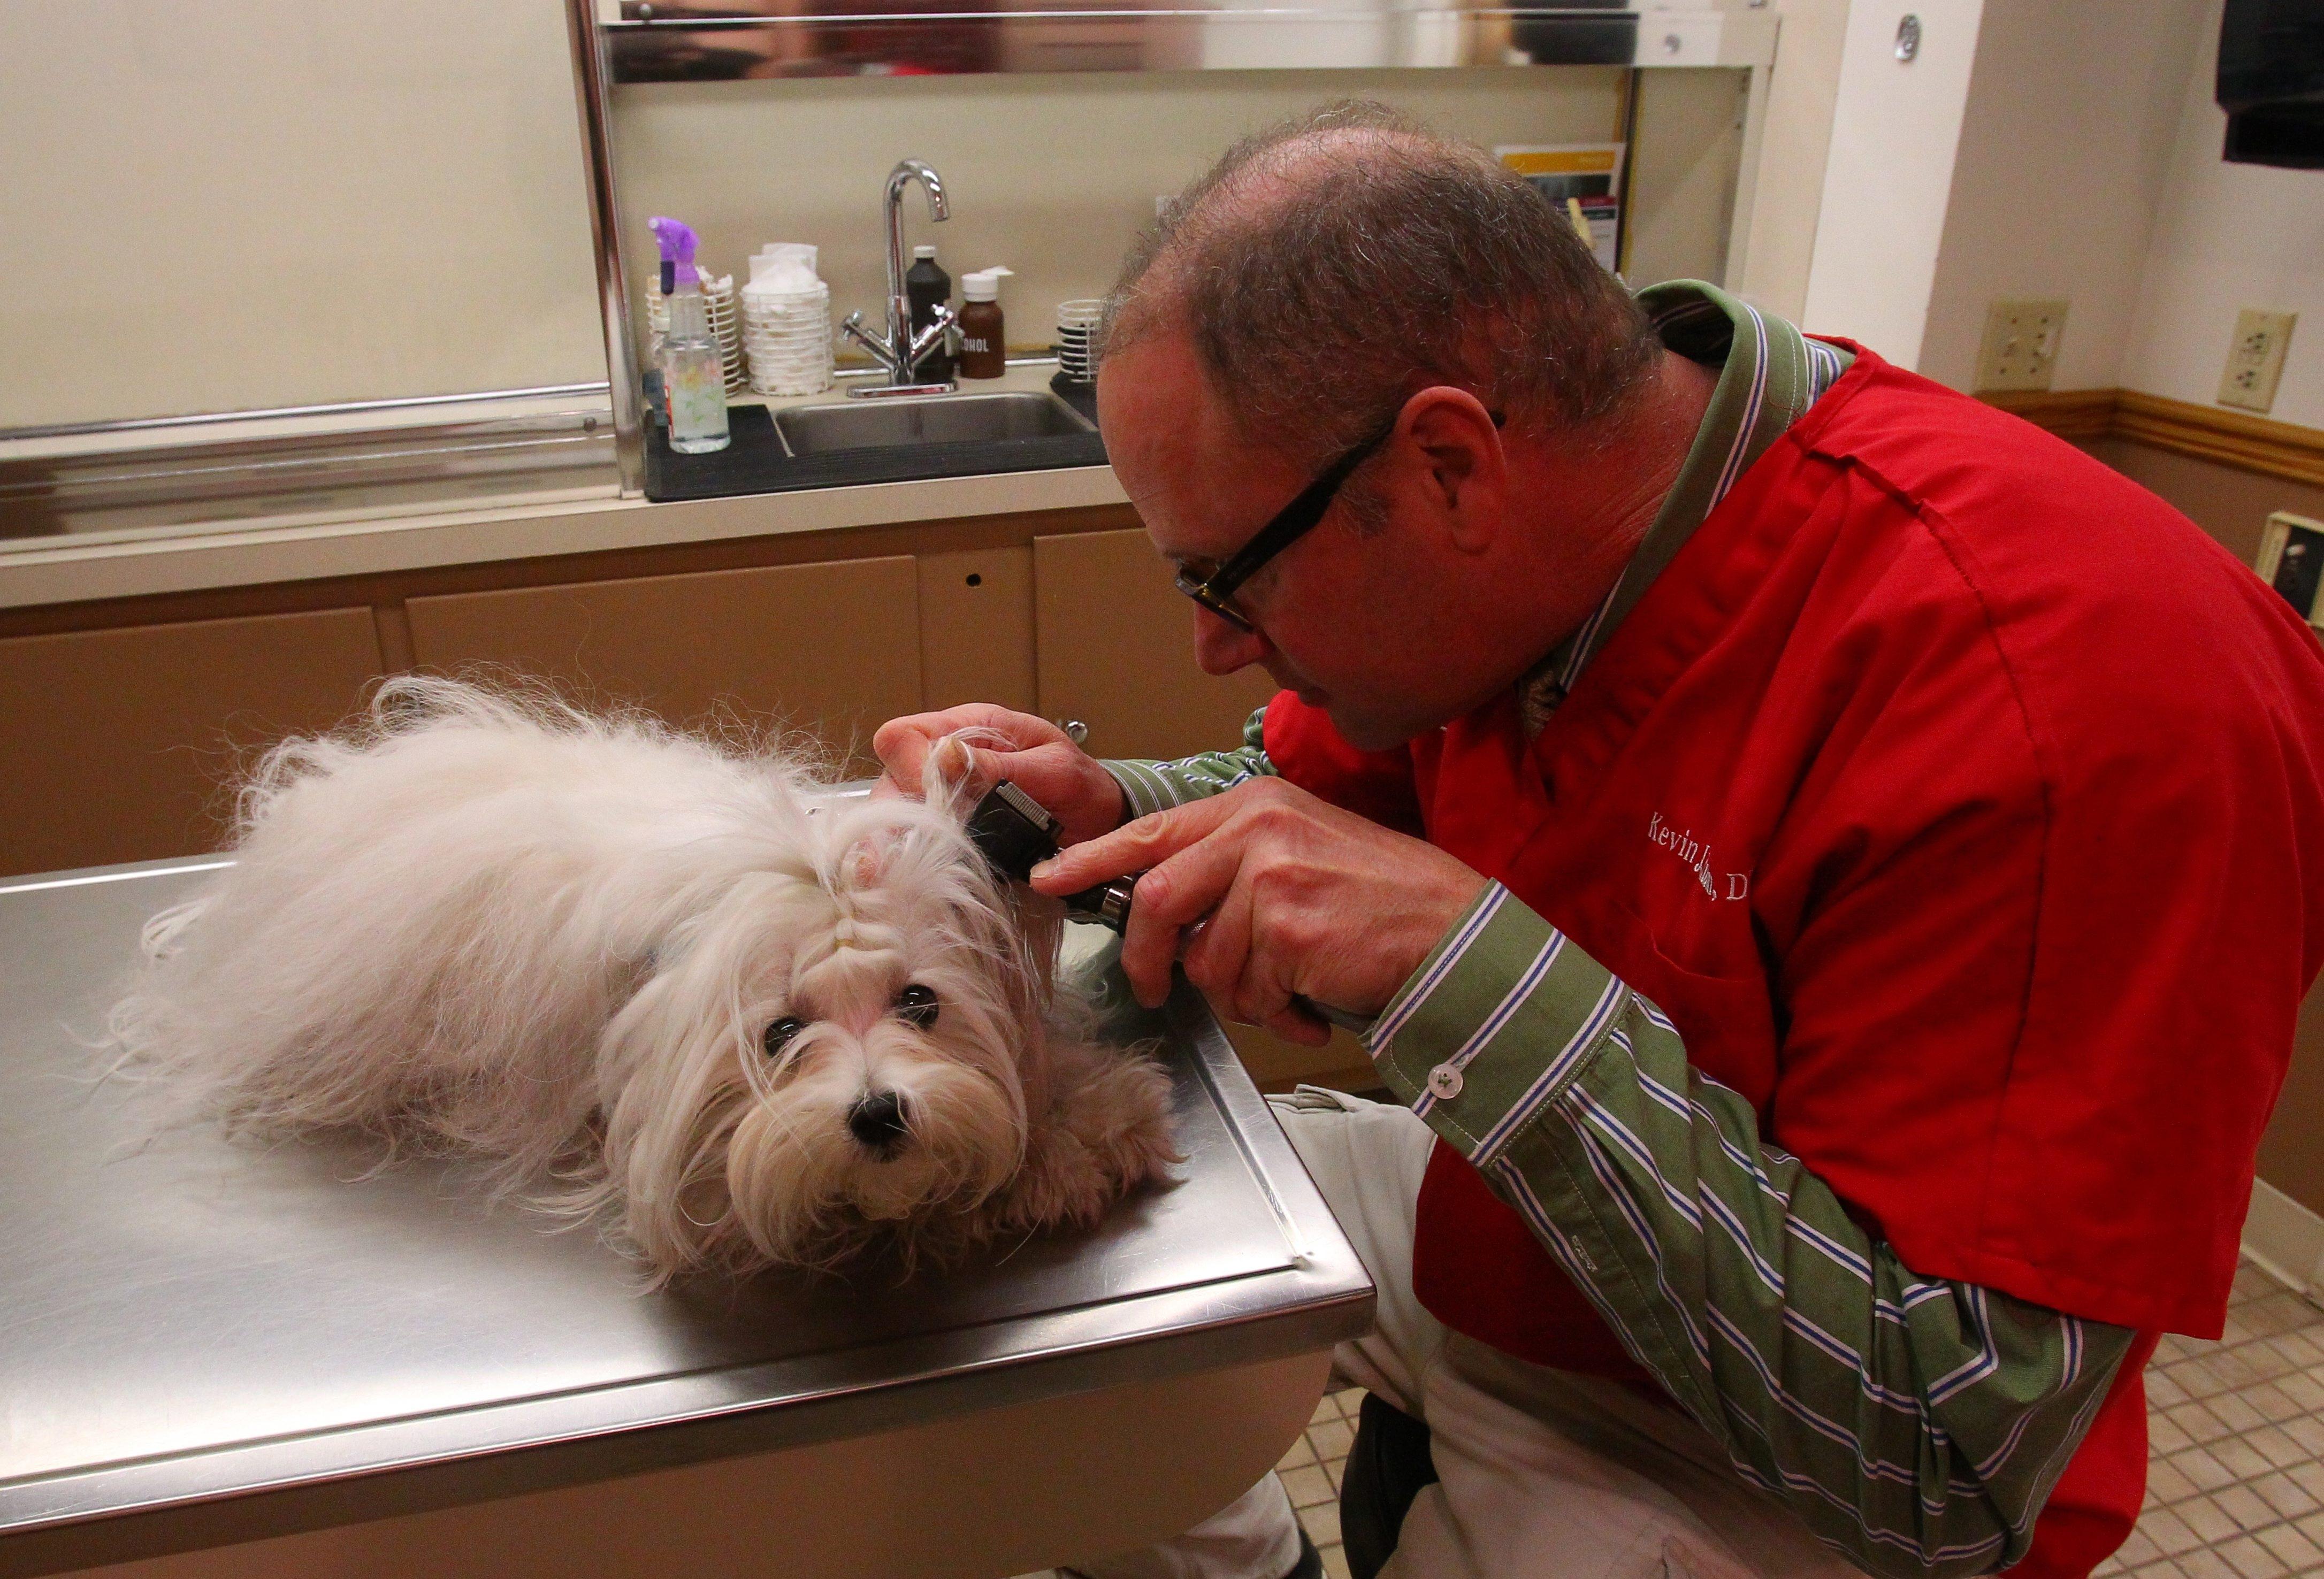 Veterinarian Kevin Kuhn does a preliminary examination of Jenevra, a Maltese at Afton Animal Hospital in Amherst last week.